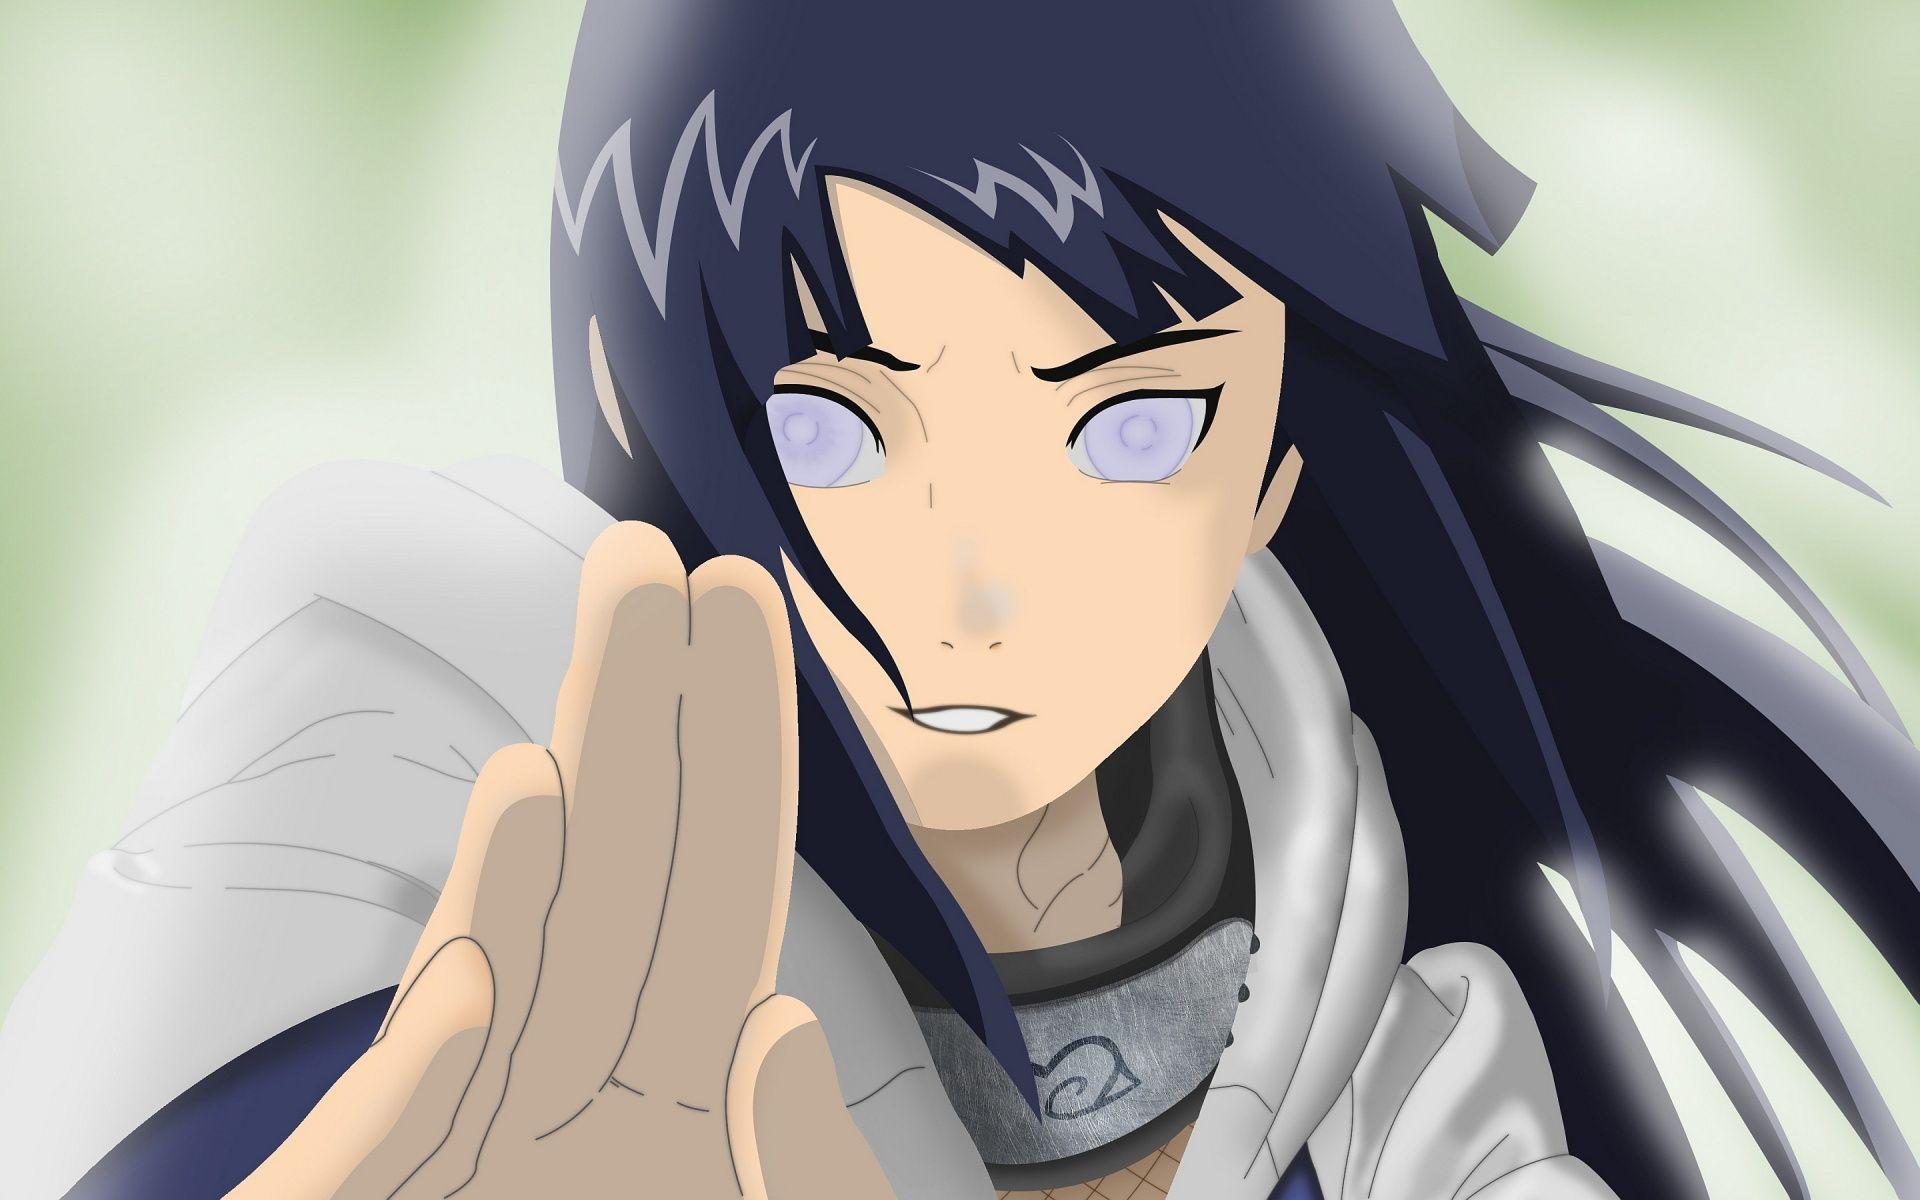 Pin on Anime HD Wallpapers